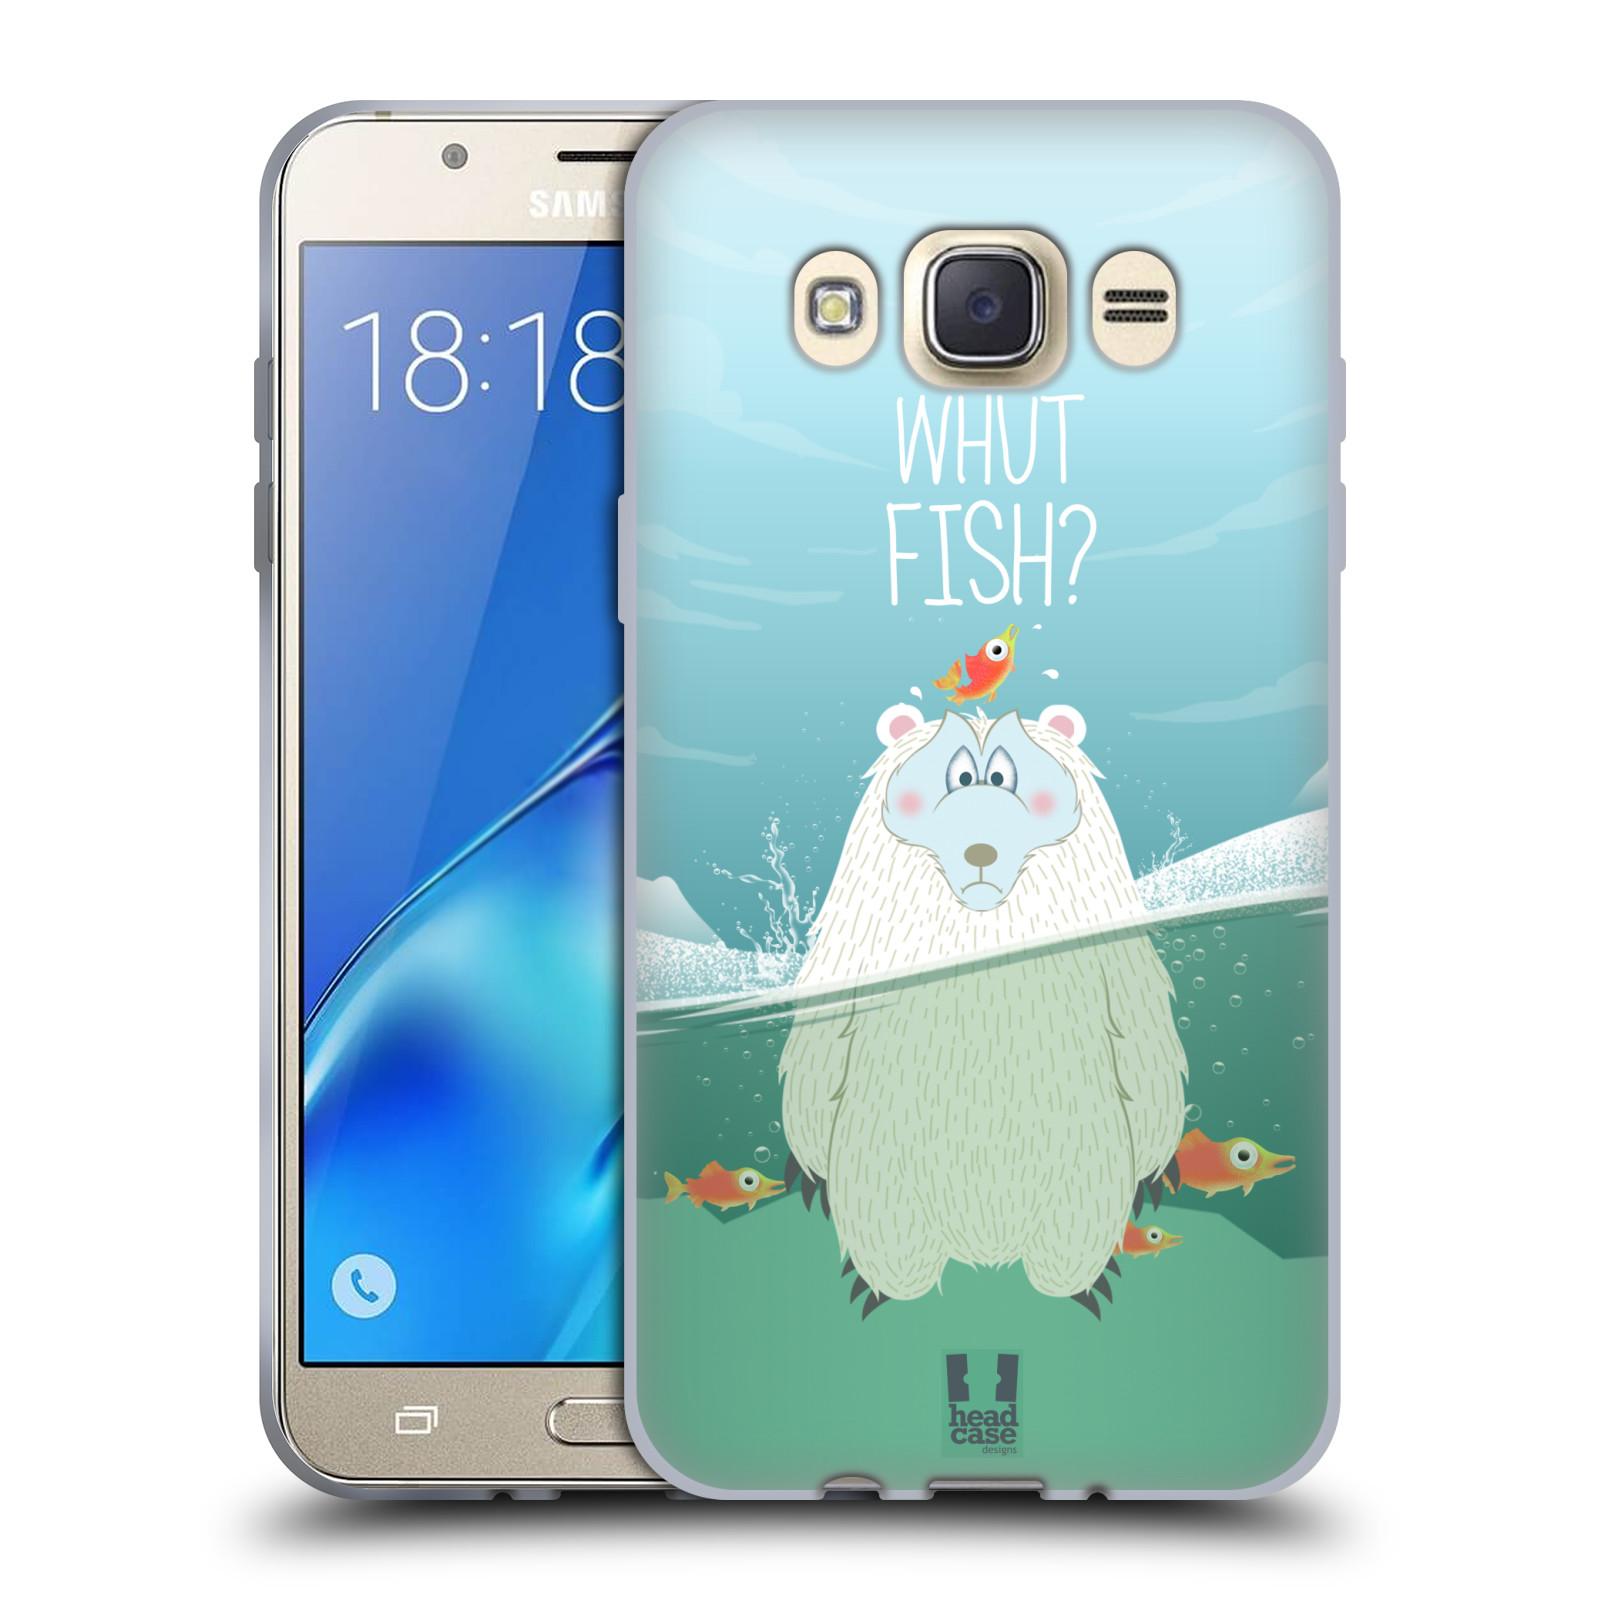 Silikonové pouzdro na mobil Samsung Galaxy J7 (2016) HEAD CASE Medvěd Whut Fish?